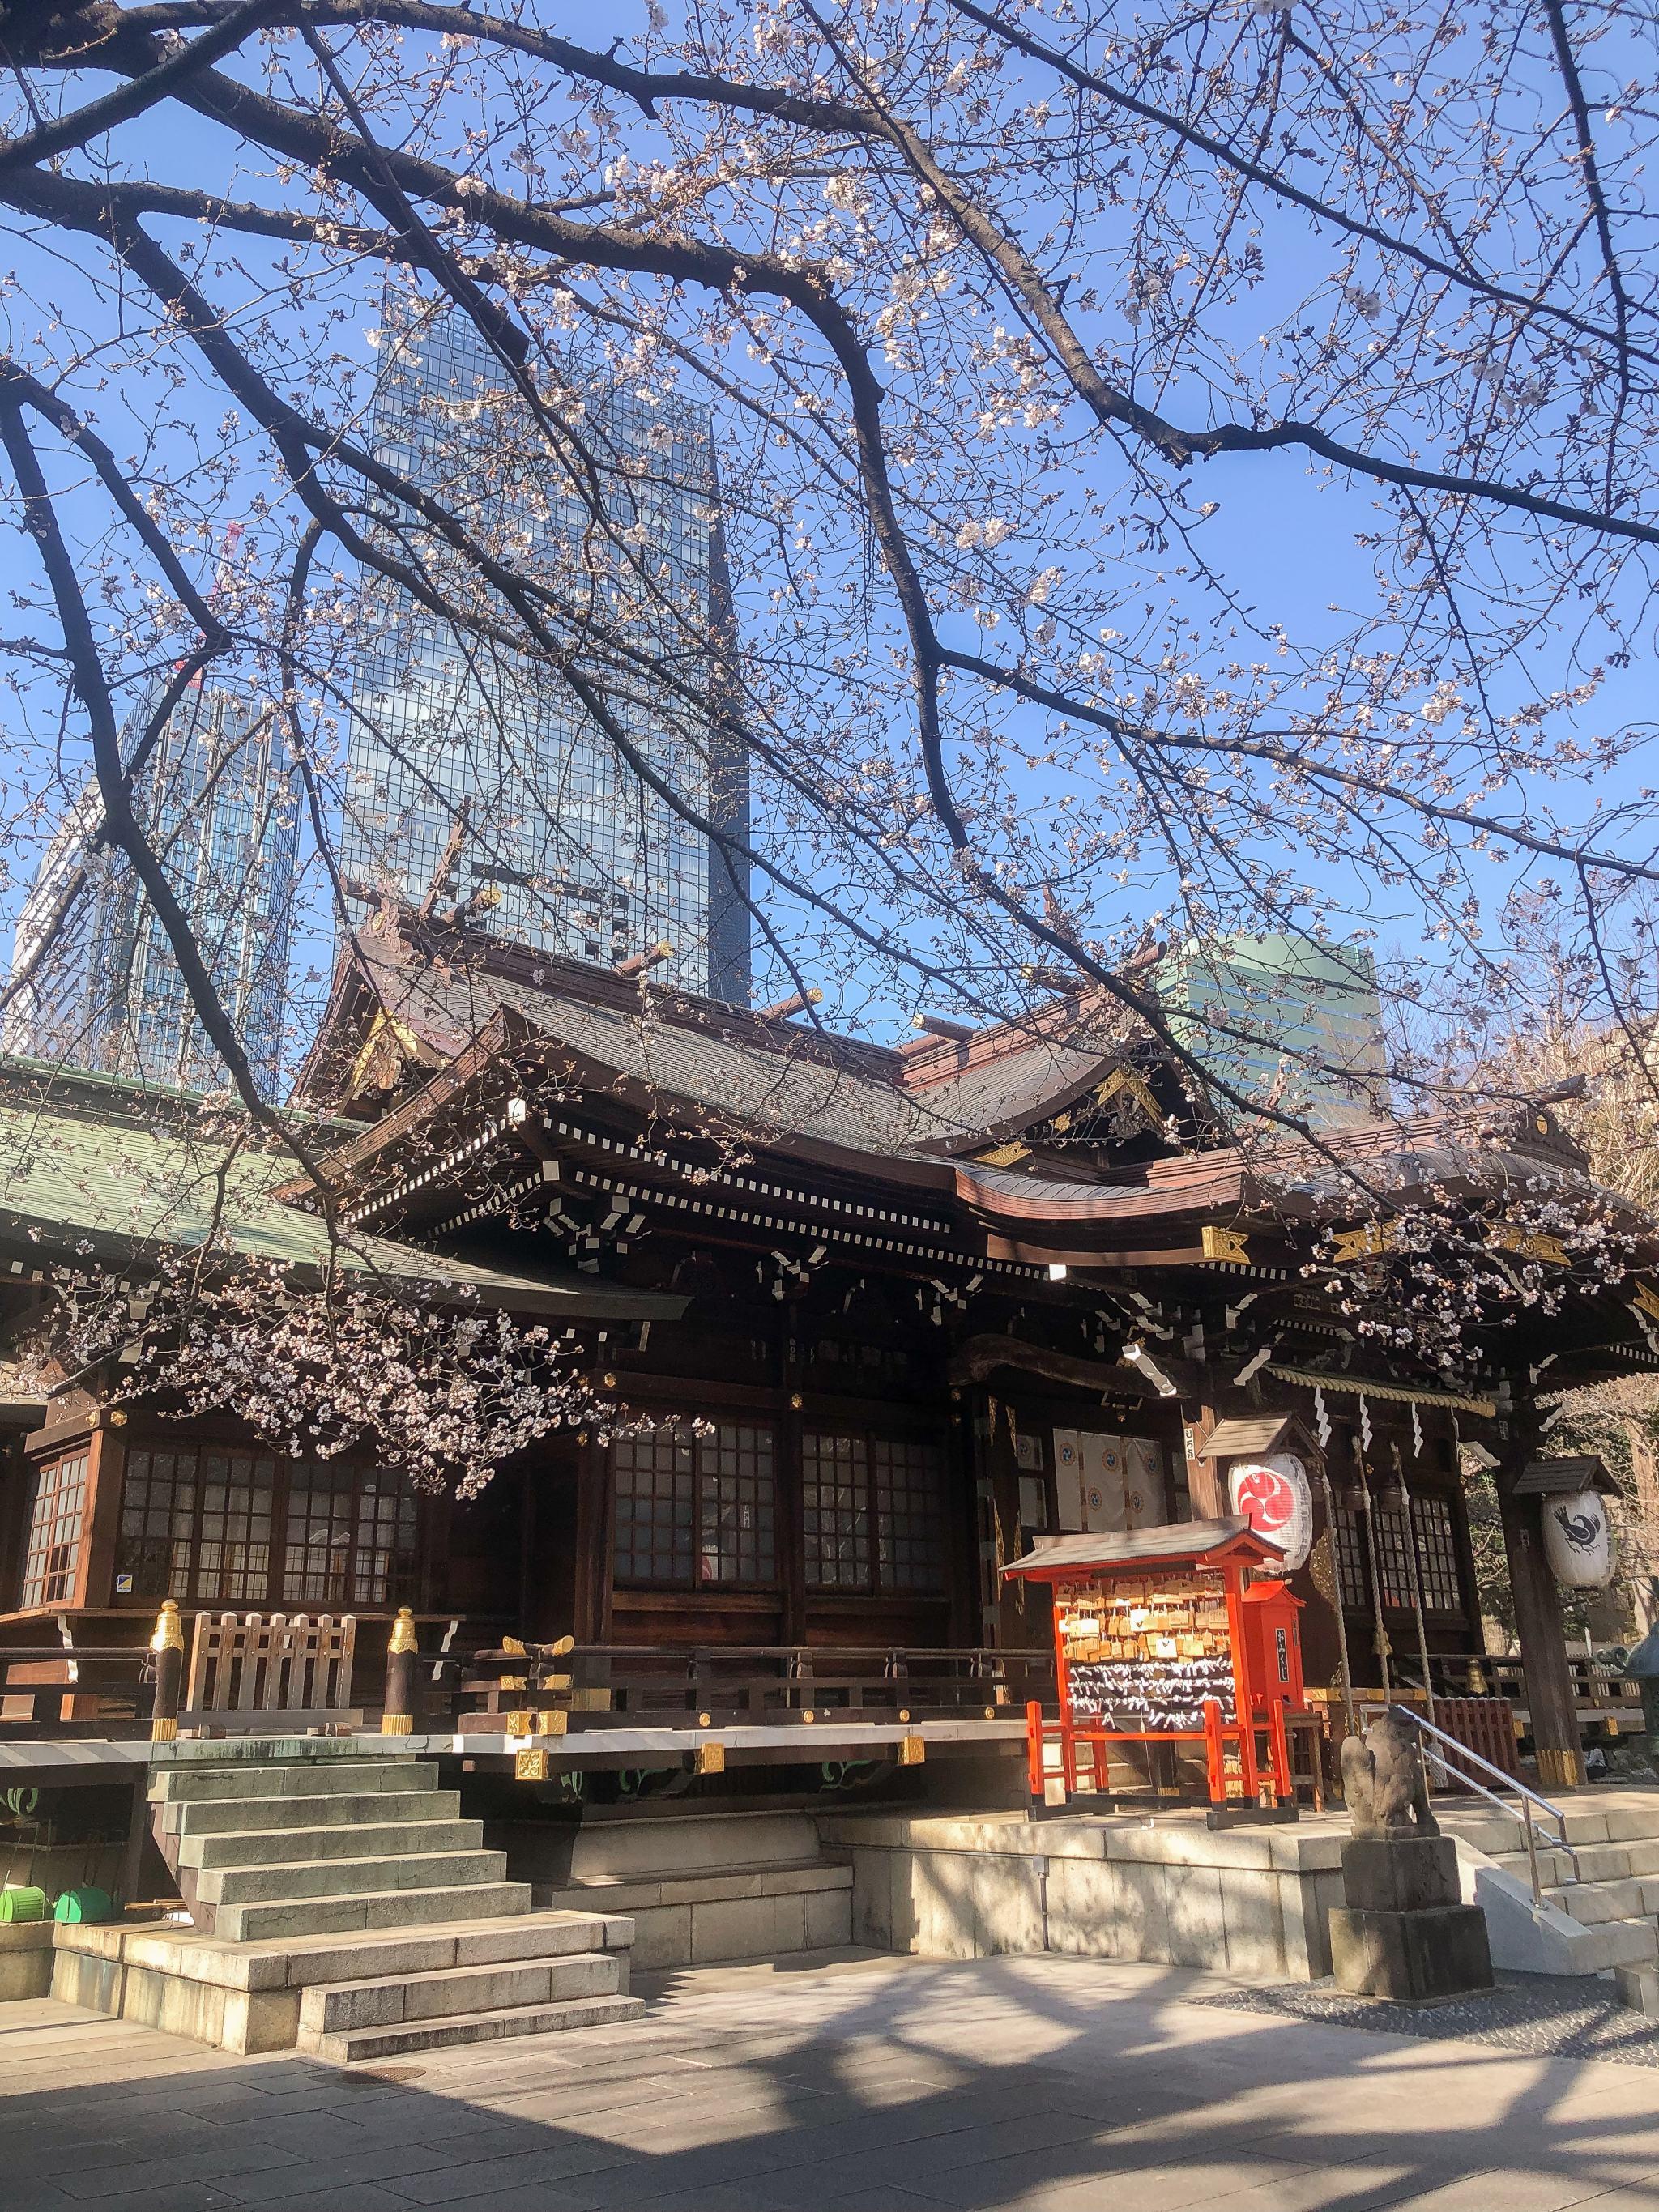 Shinjuku Chuo Park shrine - shrine in Tokyo - shinjuku shrine